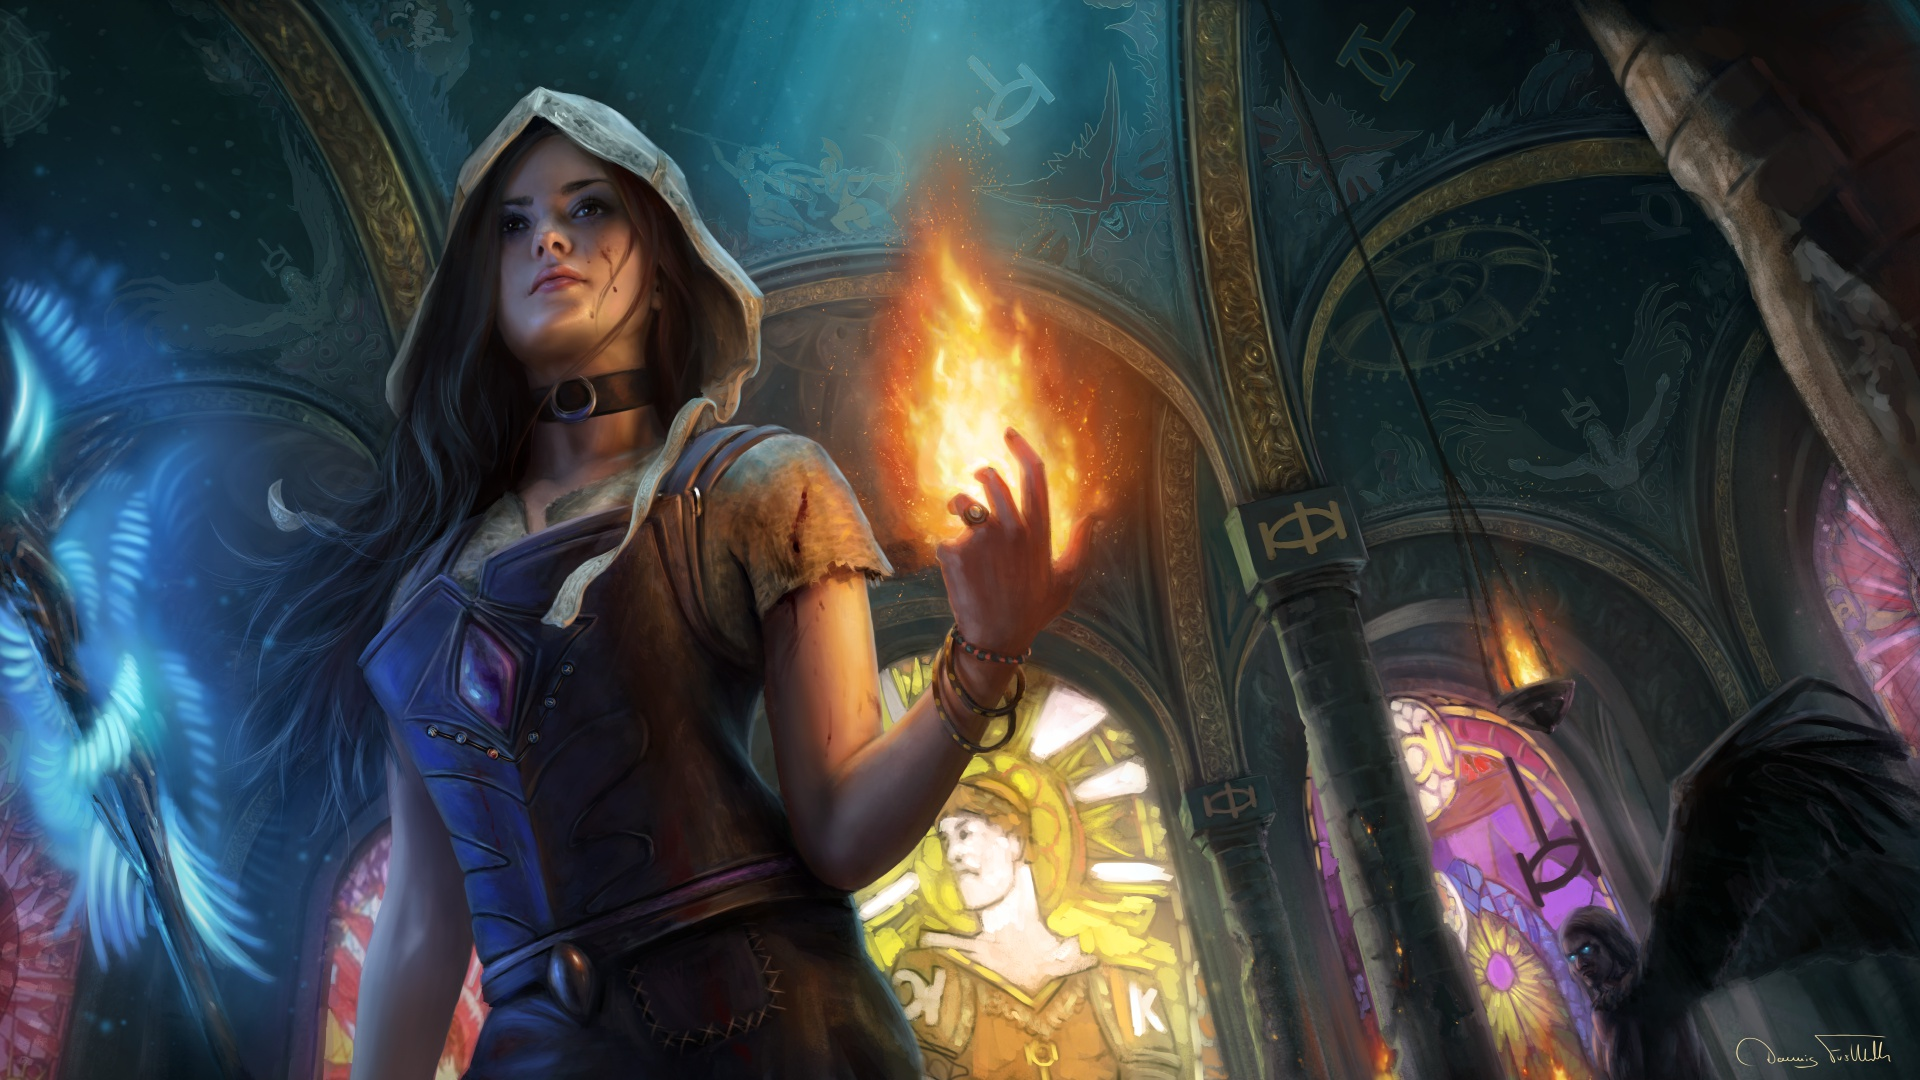 Path Of Exile Wallpaper: Path Of Exile Fantasy Girl Artwork, HD Games, 4k